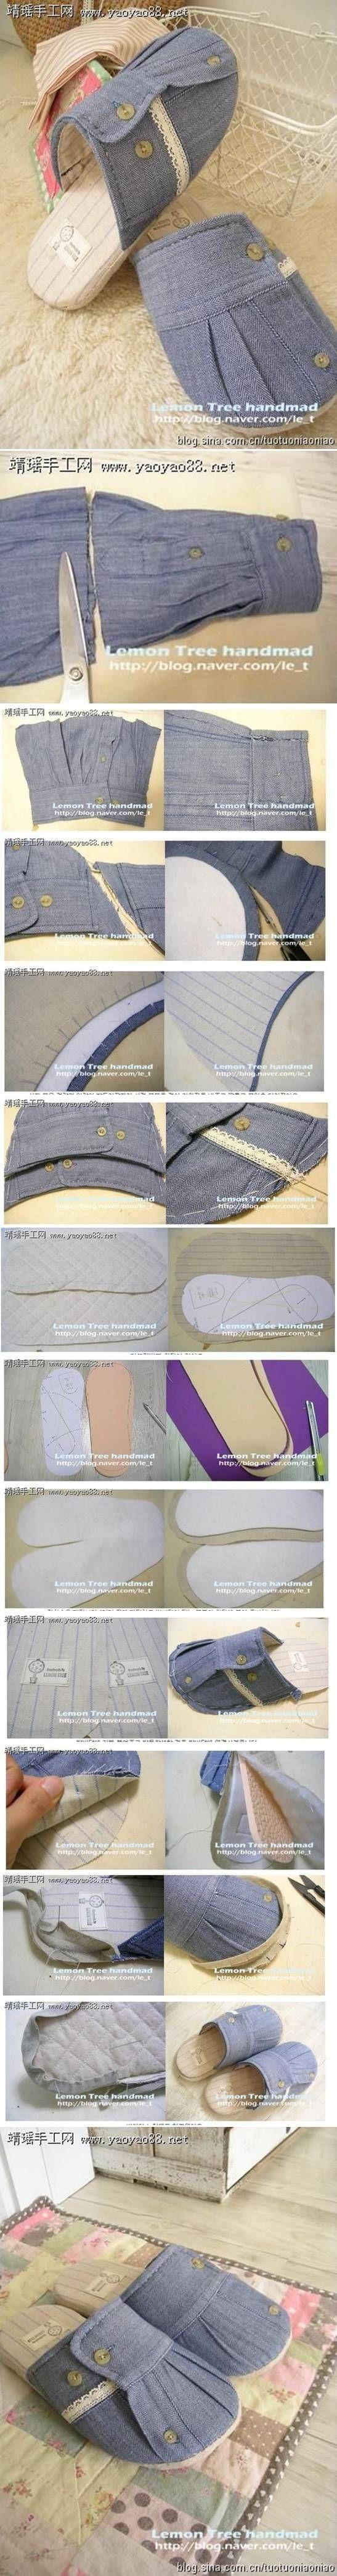 DIY Old Clothes Cuff Slipper DIY Old Clothes Cuff Slipper by diyforever